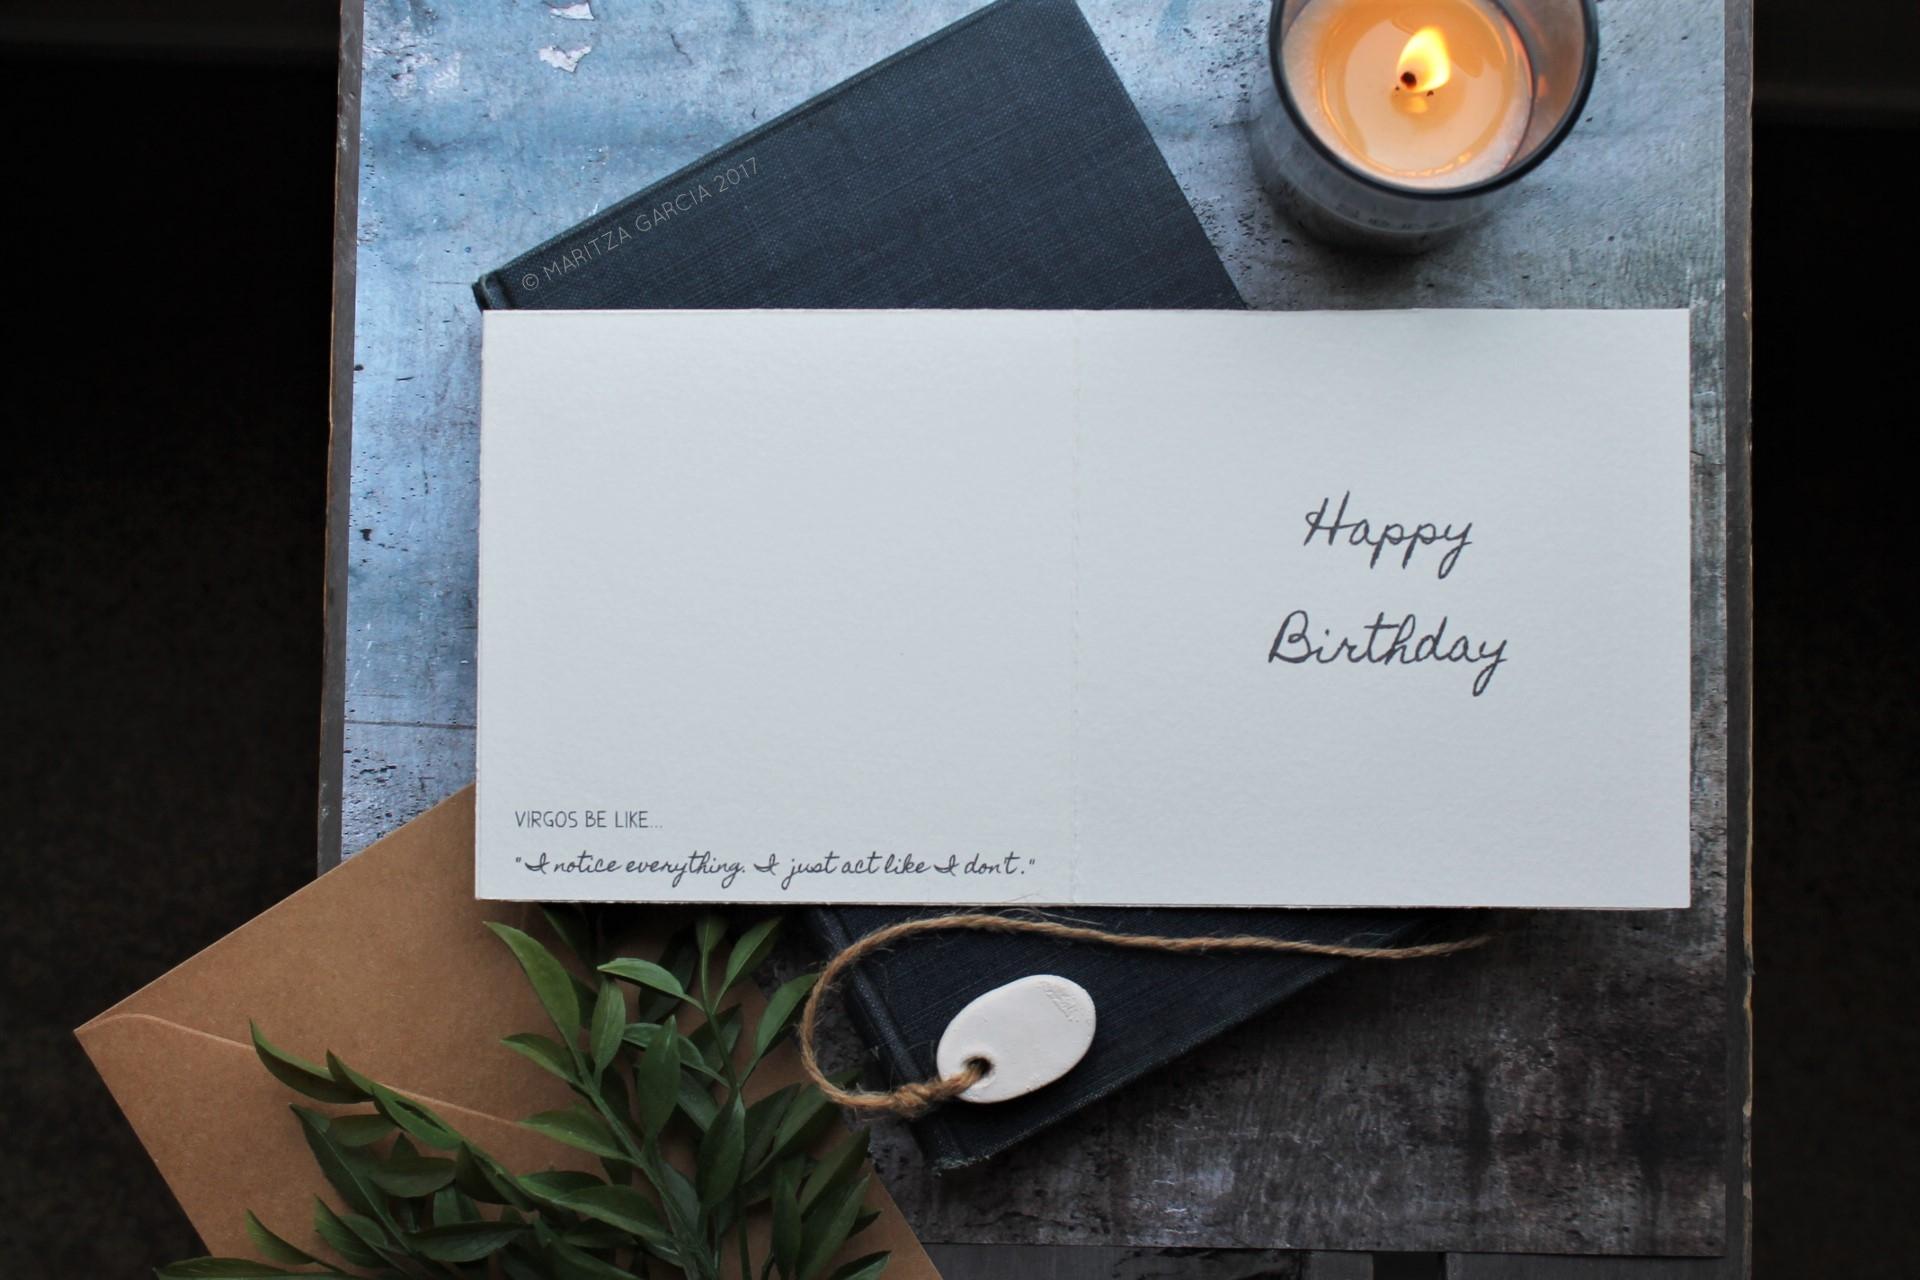 Virgo at Rest Birthday Card | www.maritzagarcia.website